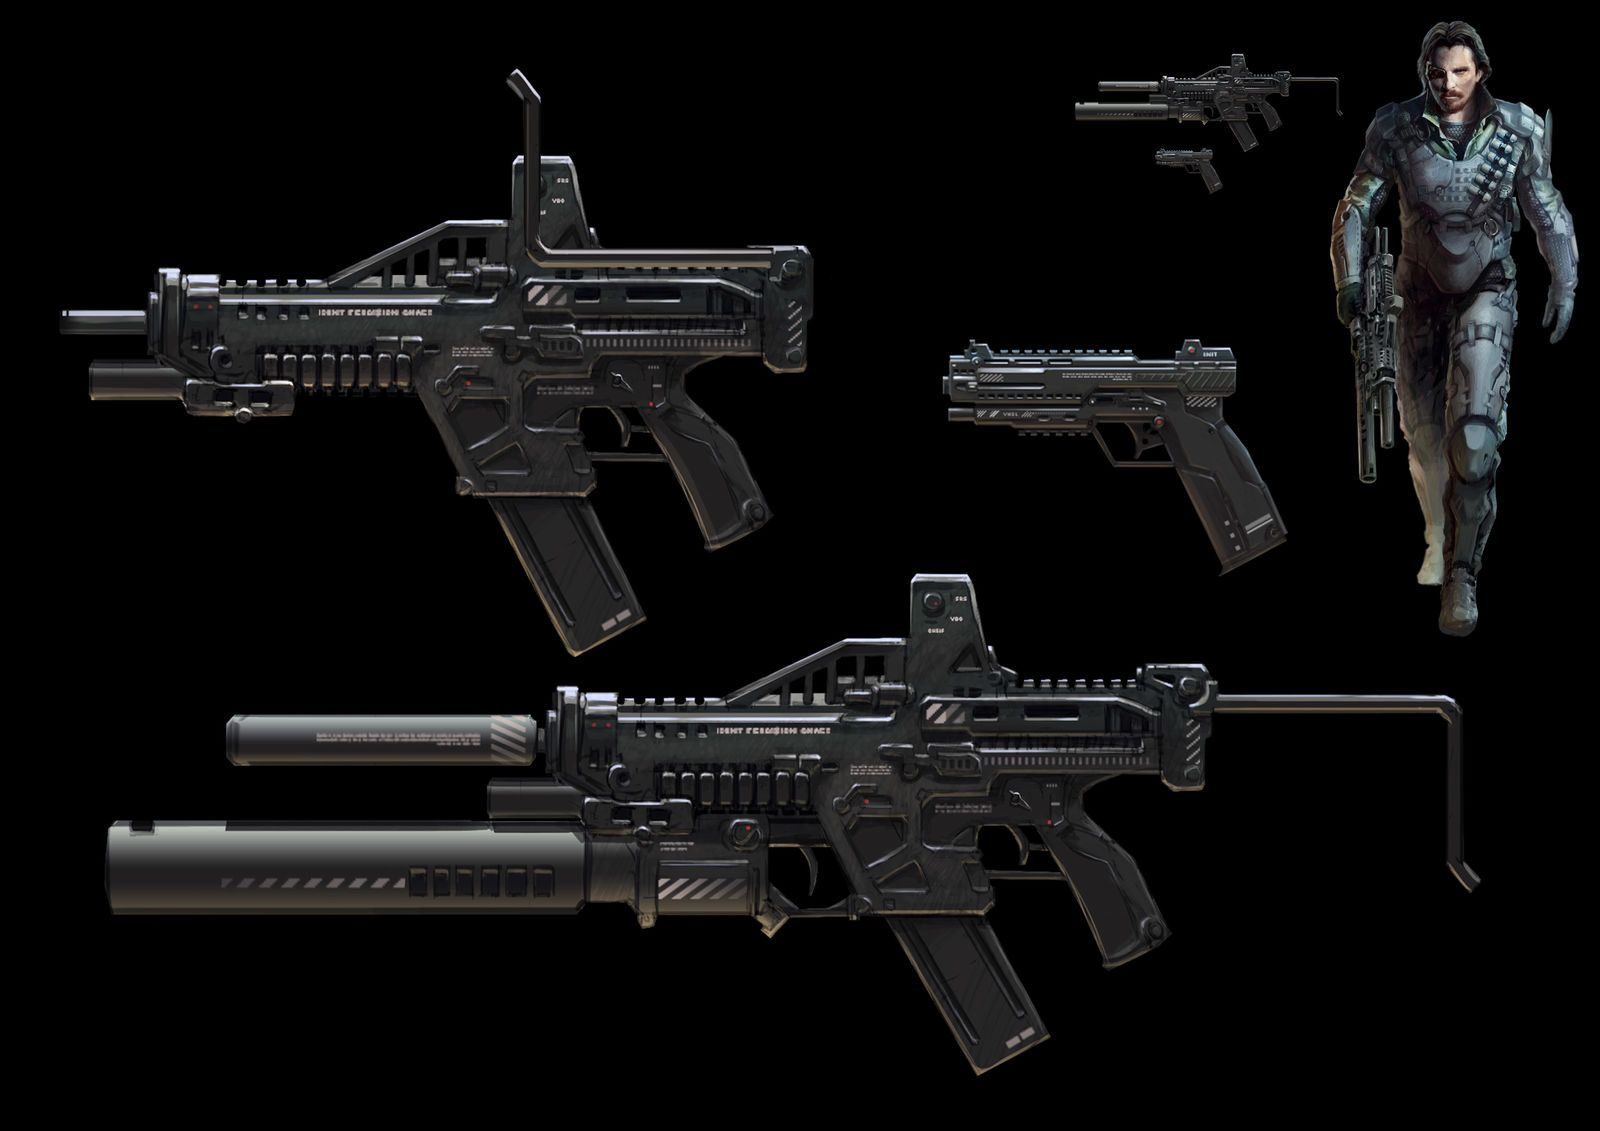 weapons sketch, Yi Yang on ArtStation at https://www.artstation.com/artwork/weapons-sketch